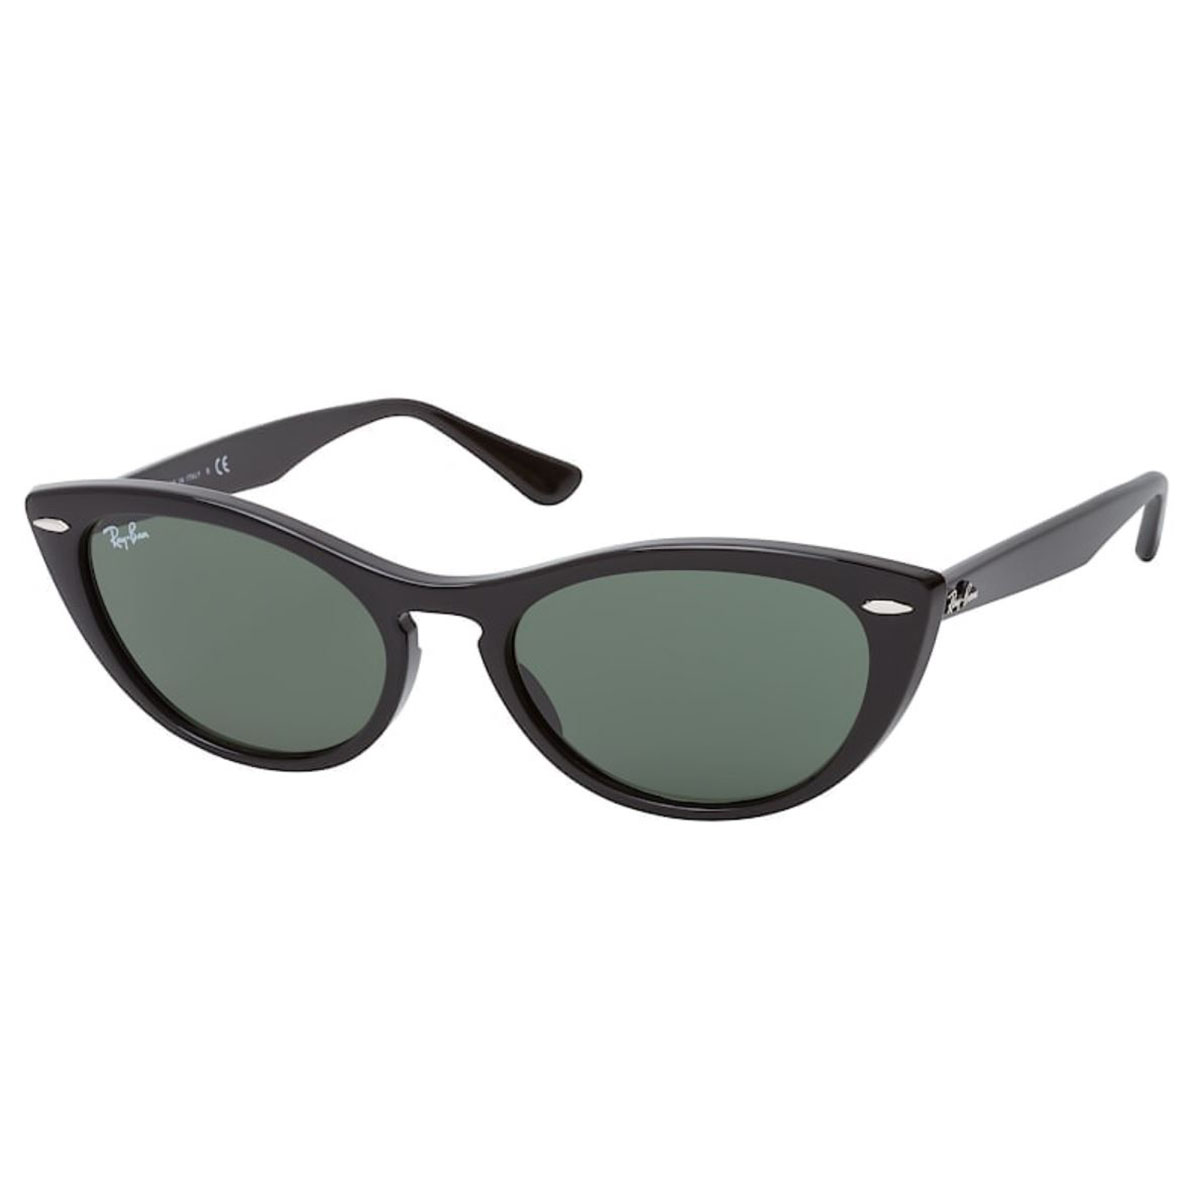 Óculos de Sol Ray Ban Feminino Gatinho RB4314N Preto Brilho